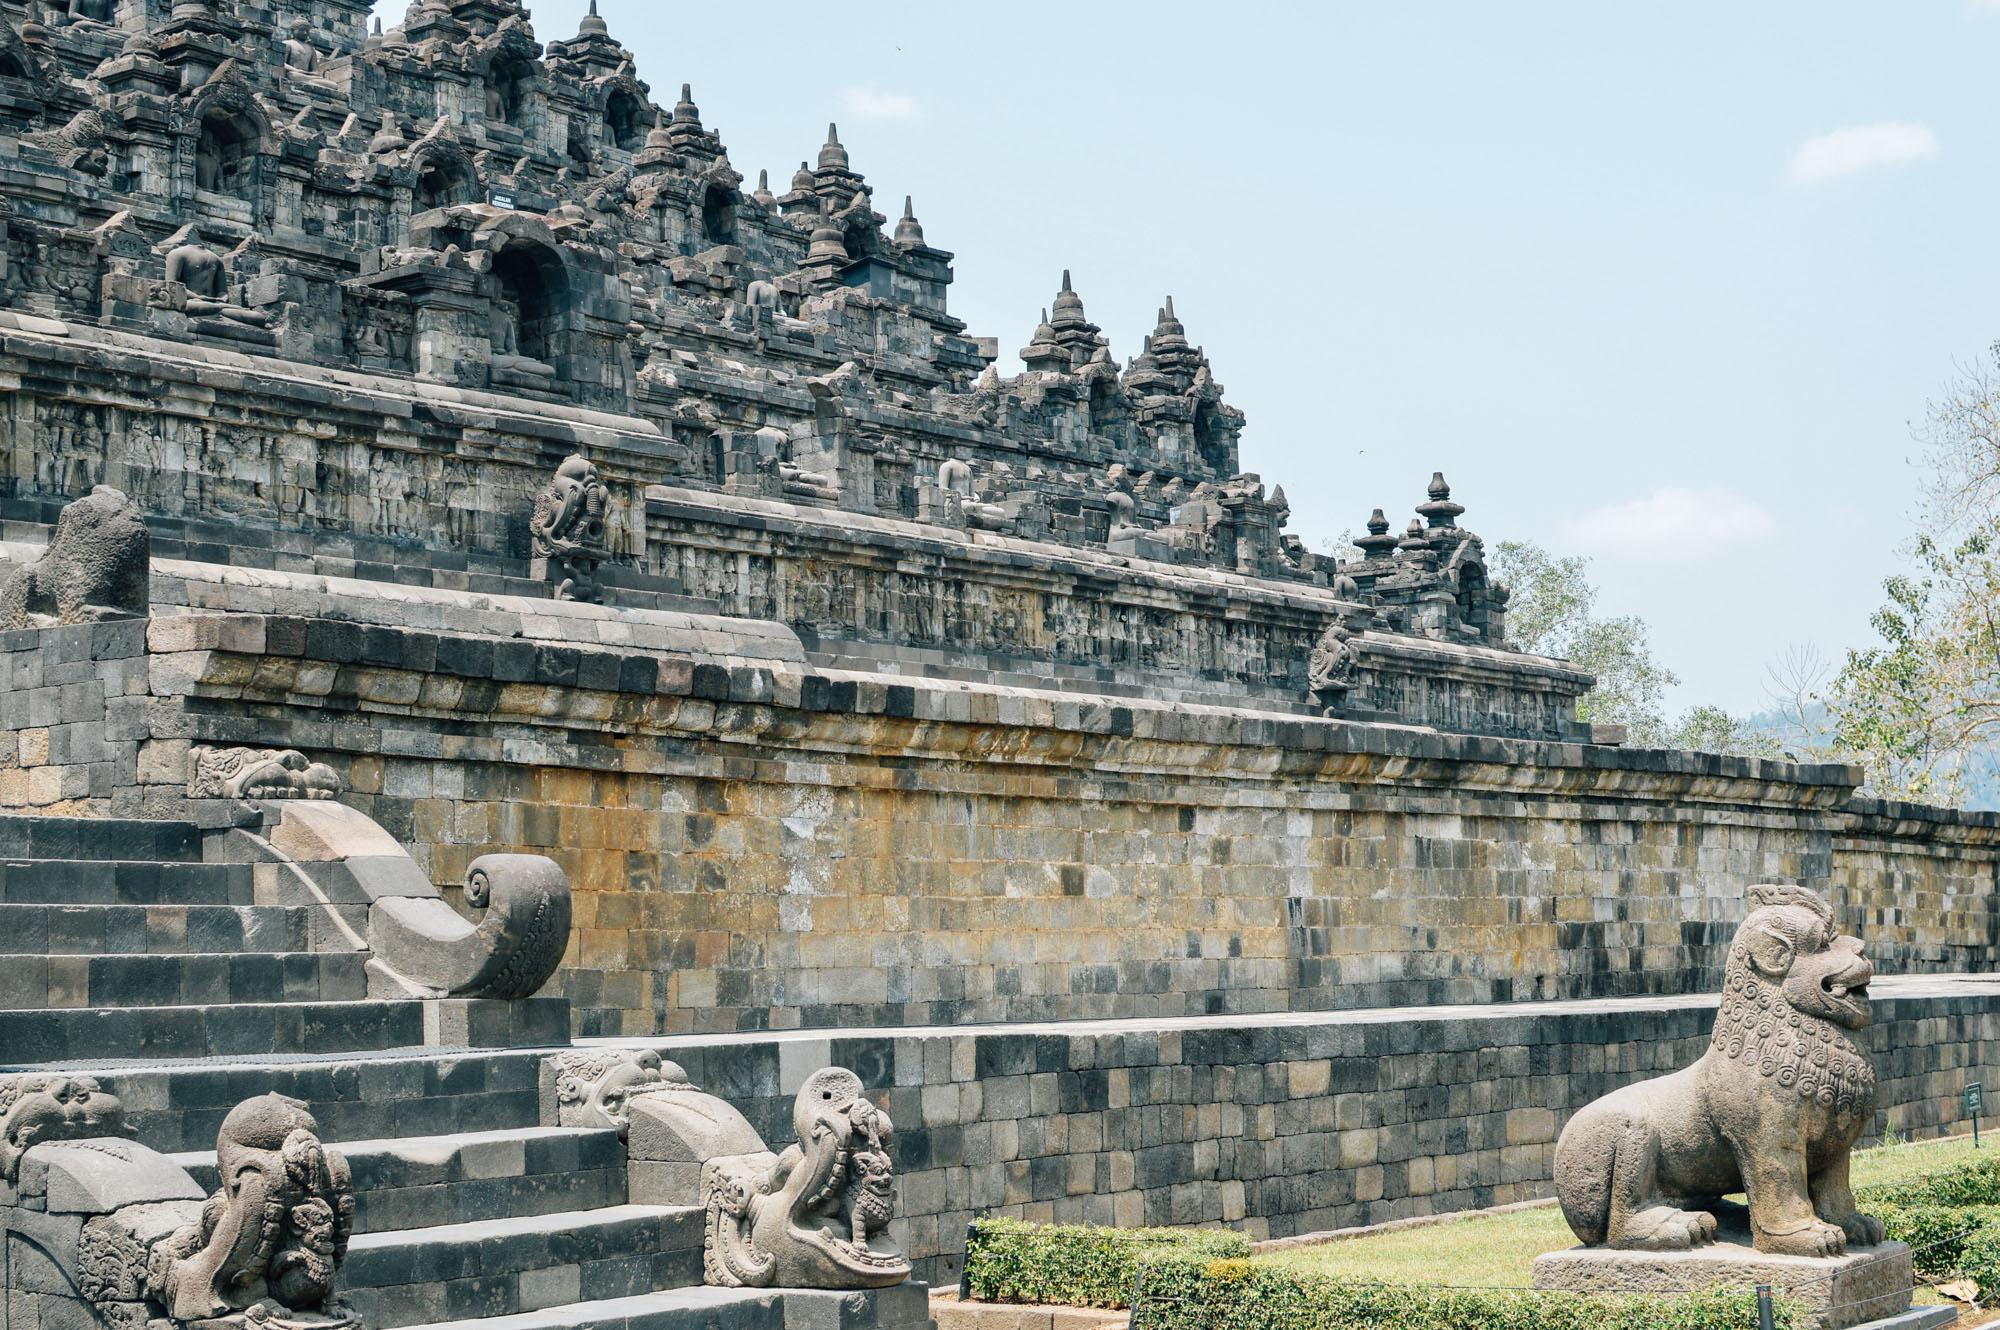 prambanan 1 - Jogyakarta with Temples